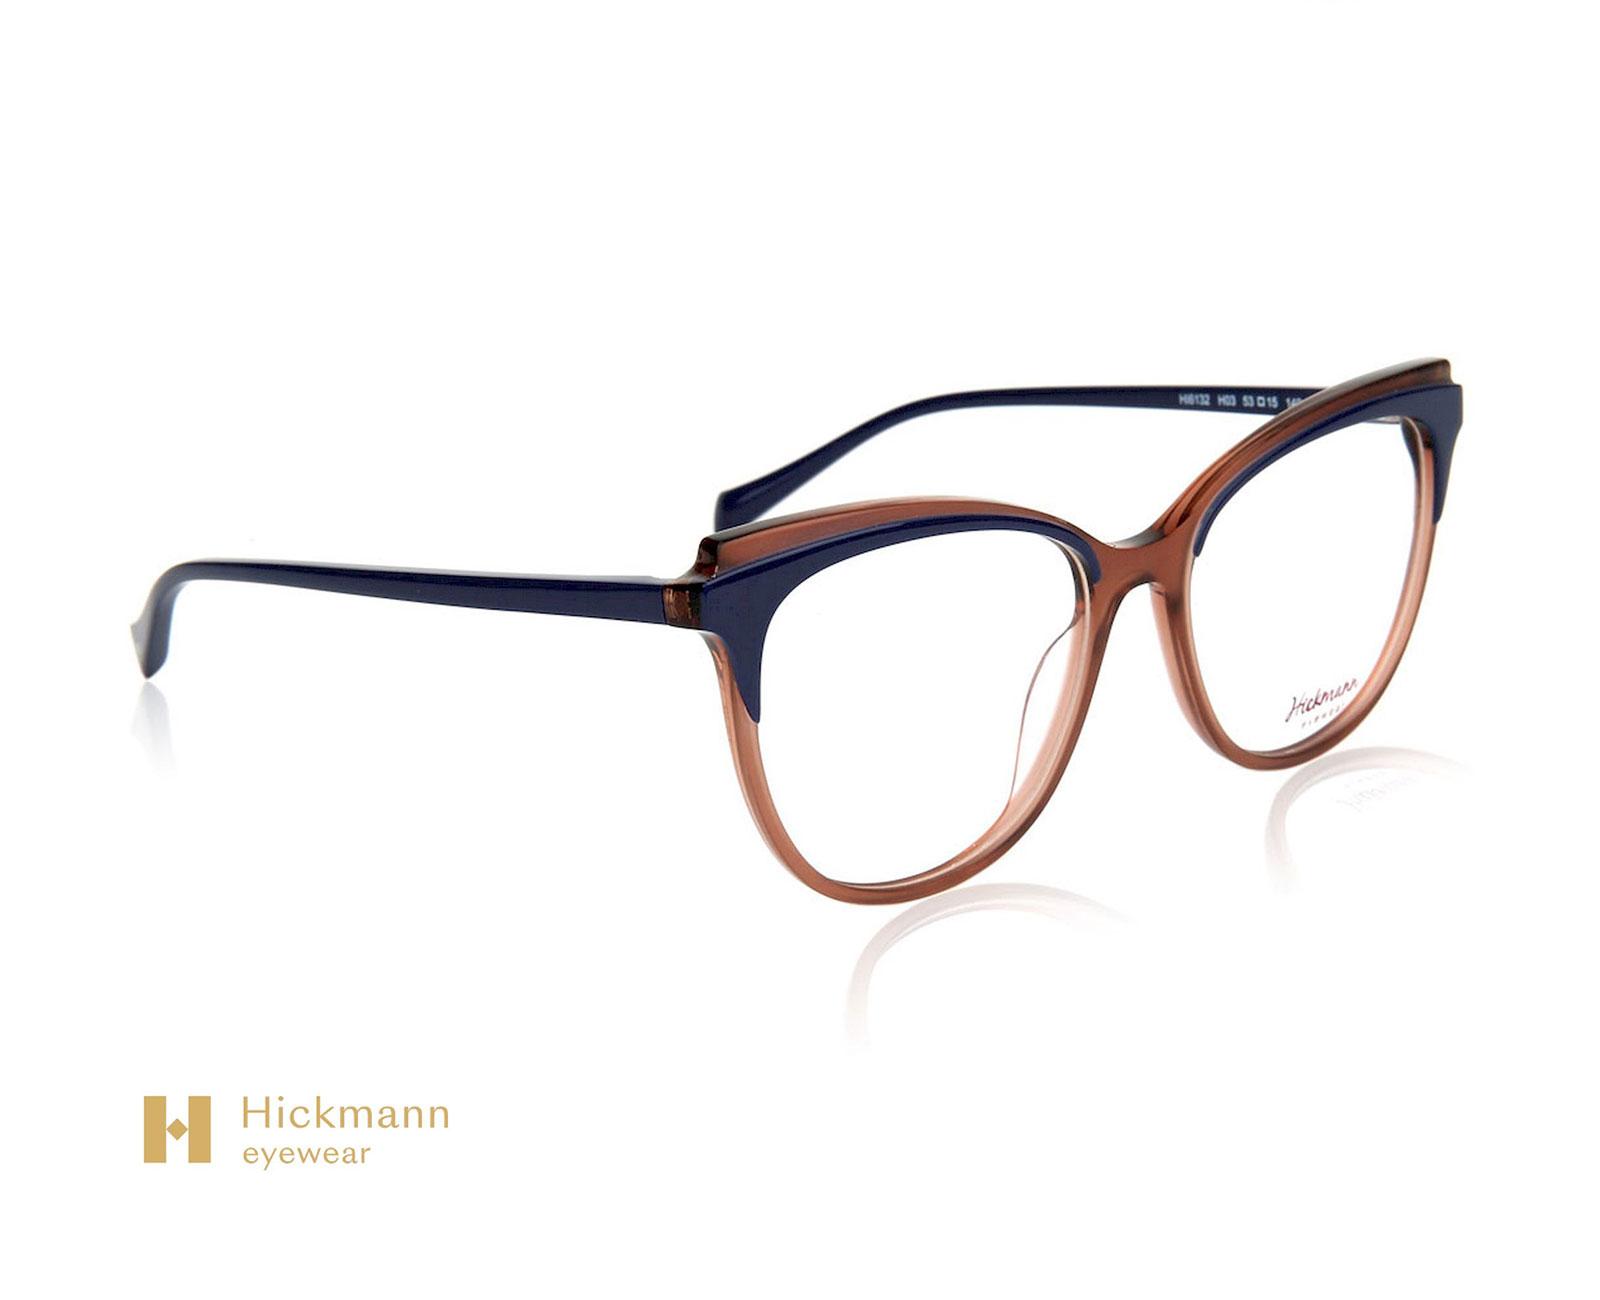 Hickmann Eyewear HI6132E in Blue/Transparent Brown